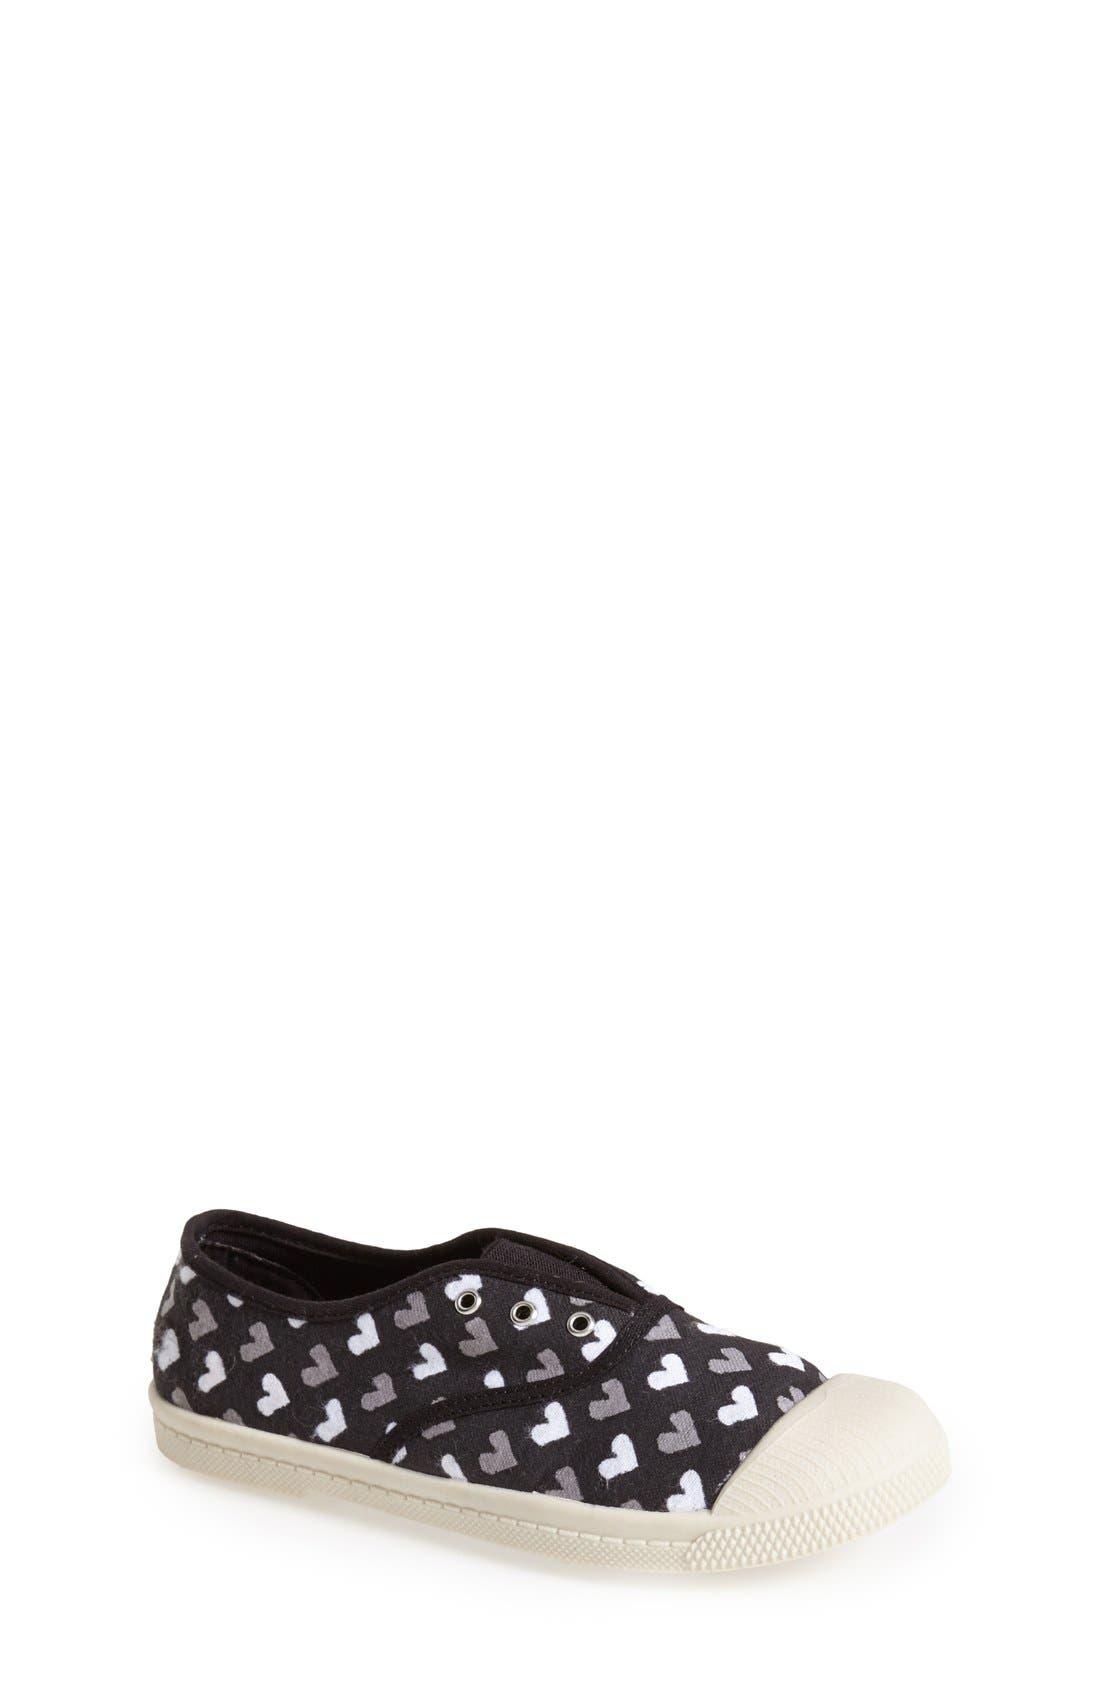 'Marin' Canvas Slip-On Sneaker,                             Main thumbnail 1, color,                             001